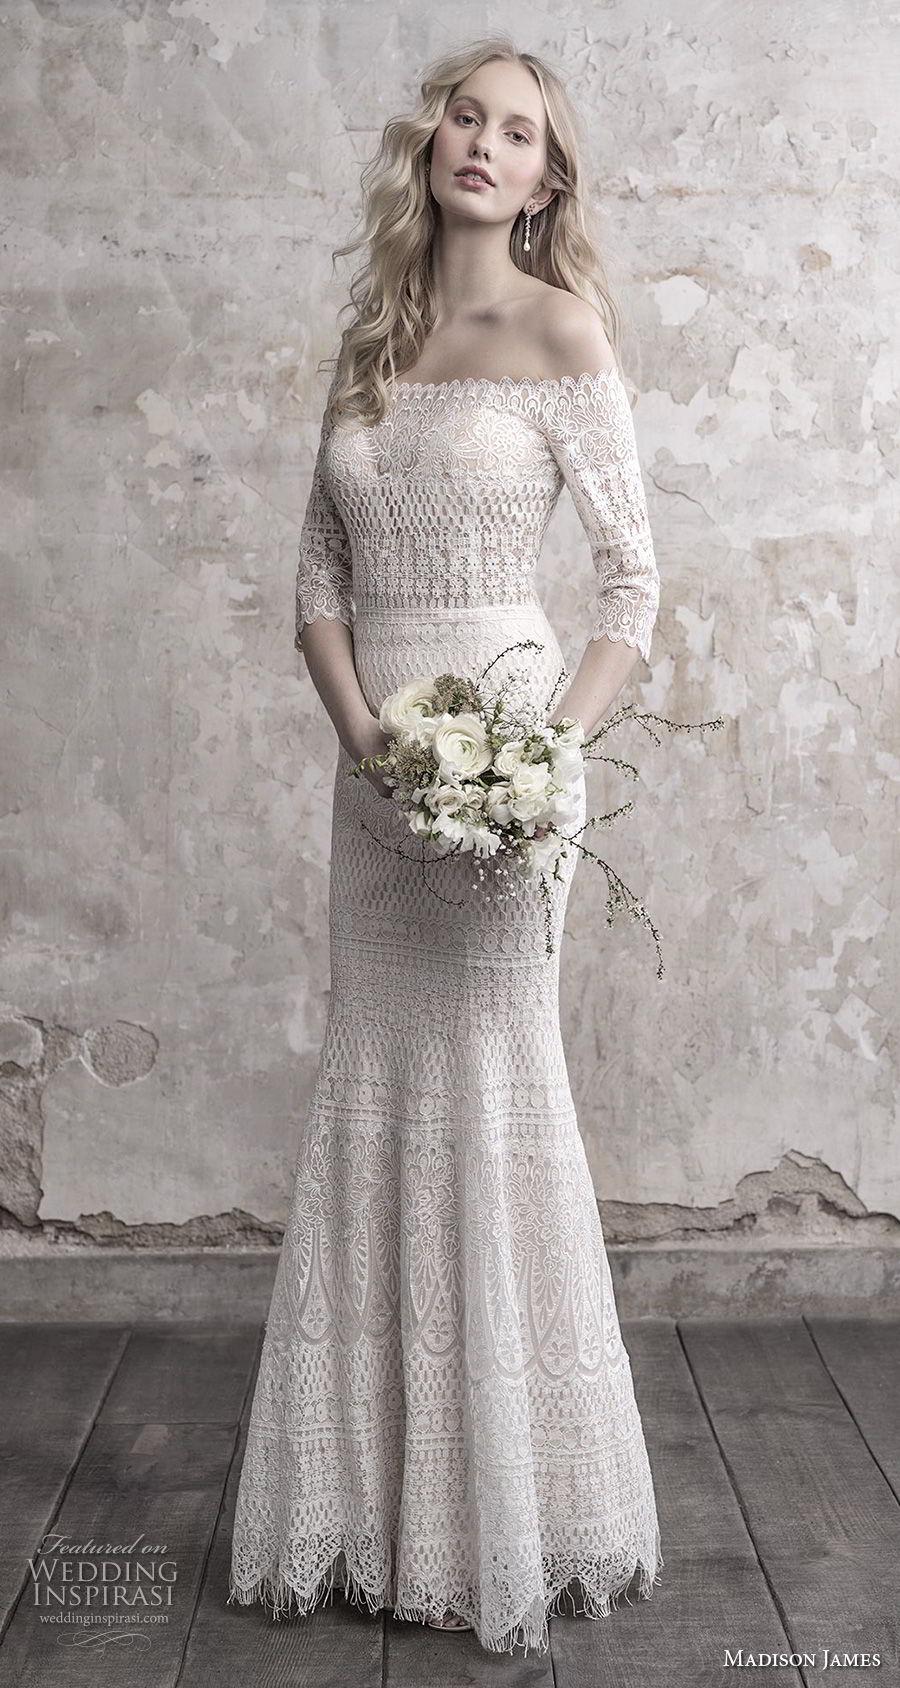 madison james fall 2018 bridal three quarter sleeves off the shoulder full embellishment elegant vintage fit and flare sheath wedding dress lace back sweep train (1) mv